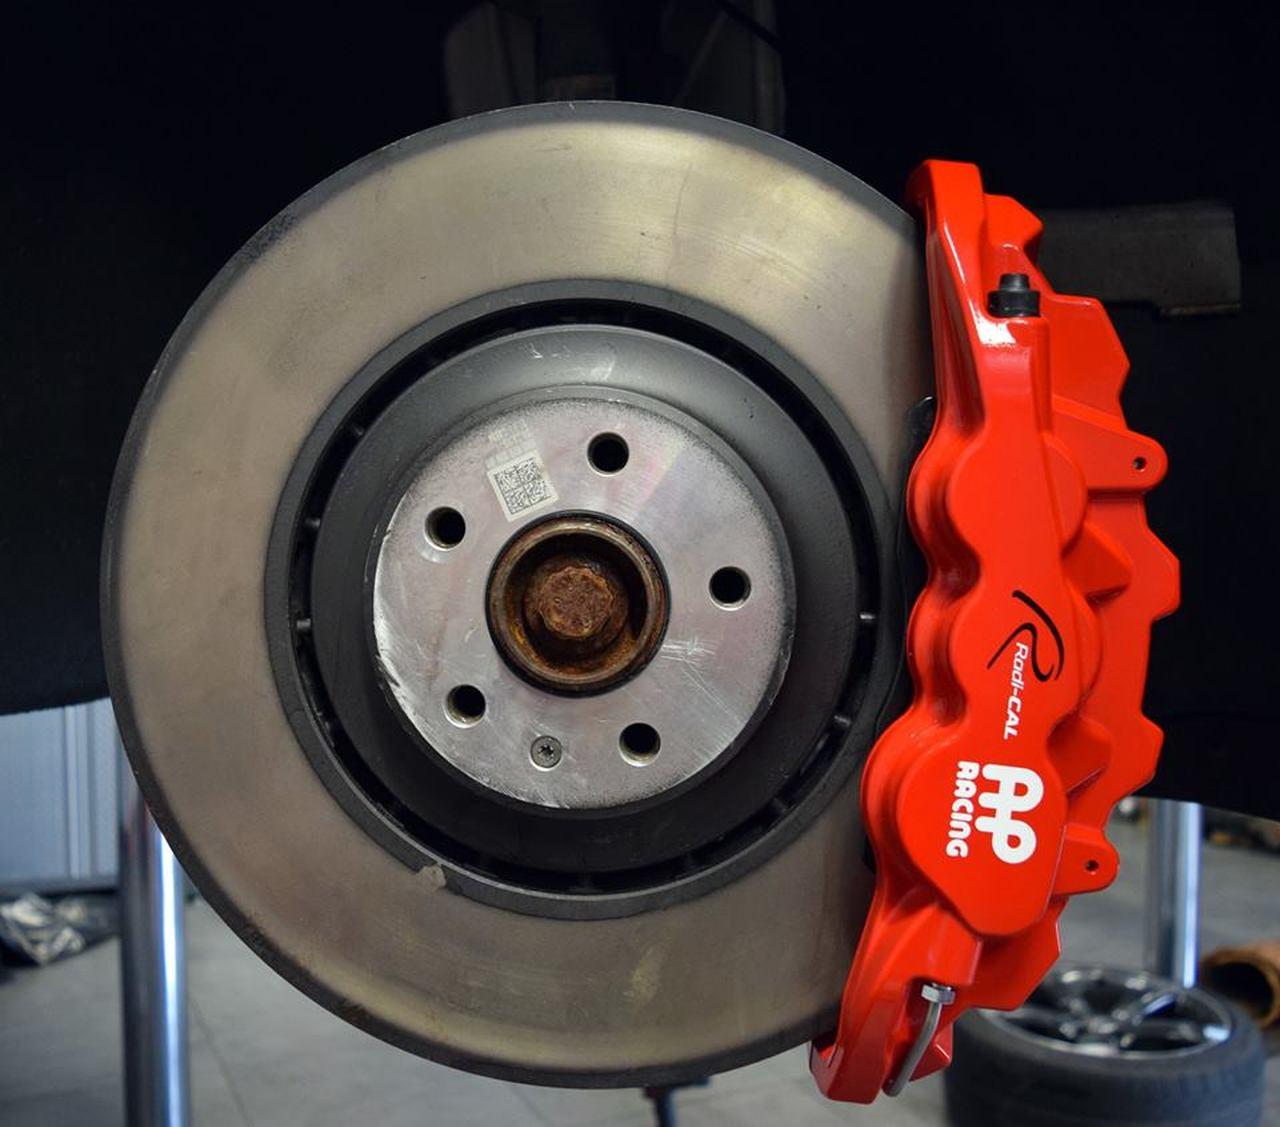 Auto Shack BRKPKG003879 Rear Performance Silver Rotors and Ceramic Pads Set